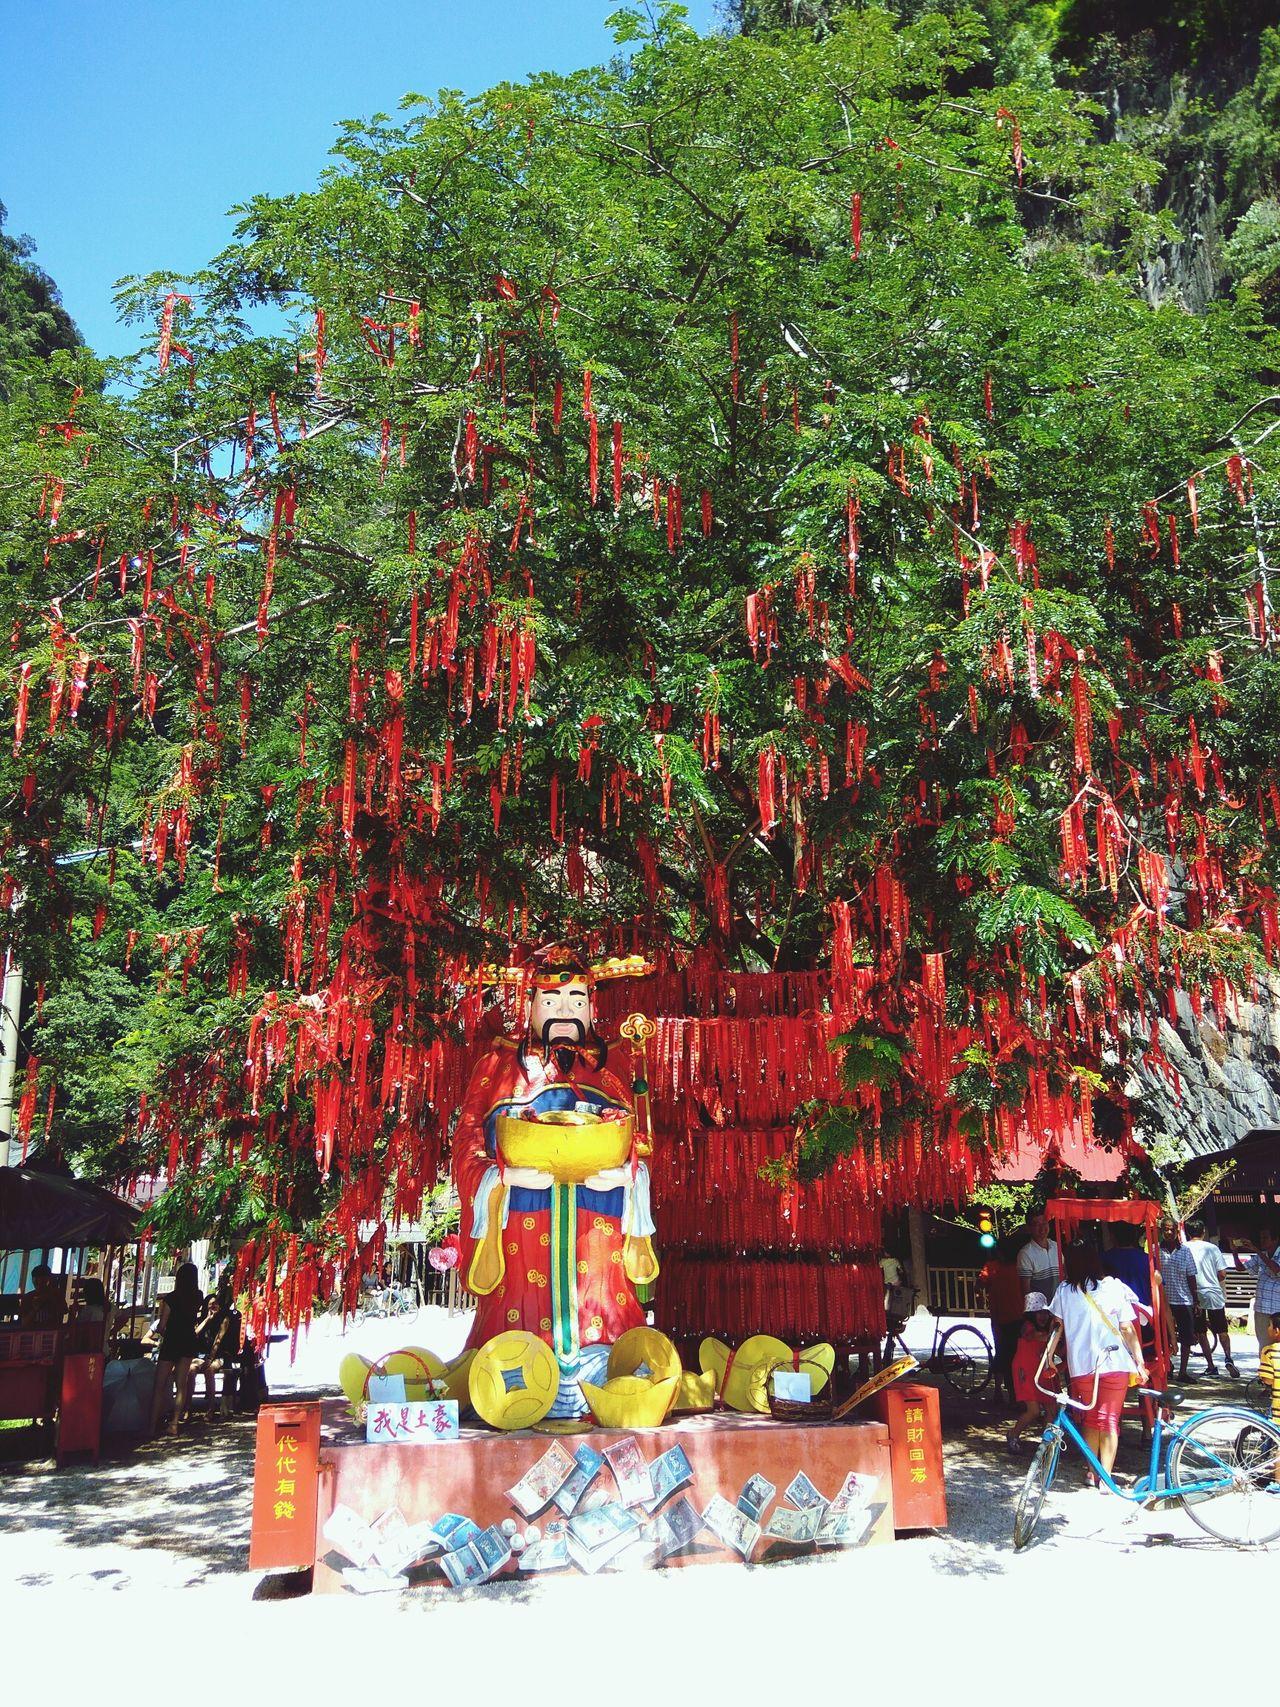 许愿树 Ipoh,Malaysia